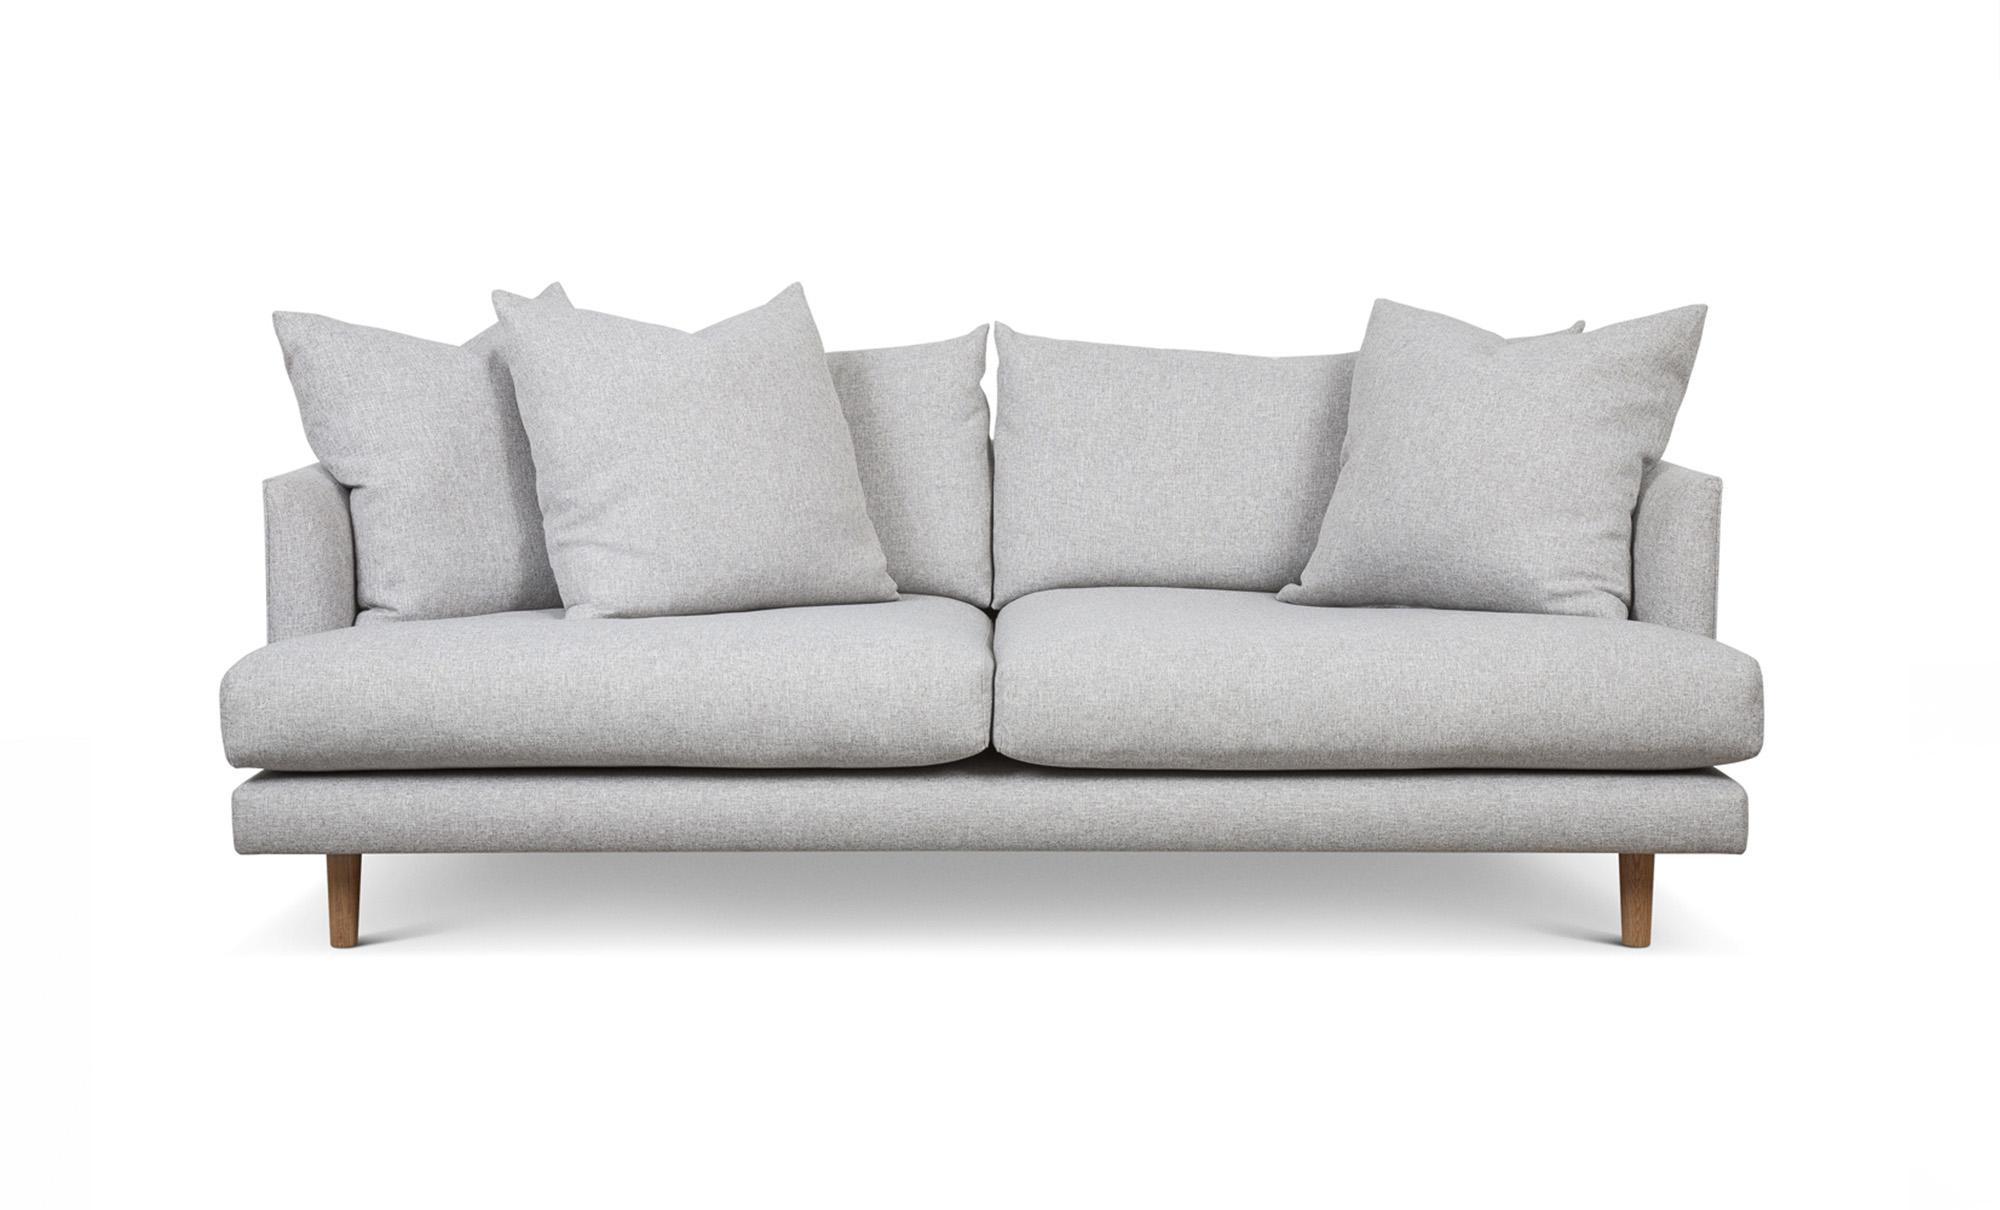 Beautiful deep seated sofa marmsweb marmsweb Deep sectional sofa